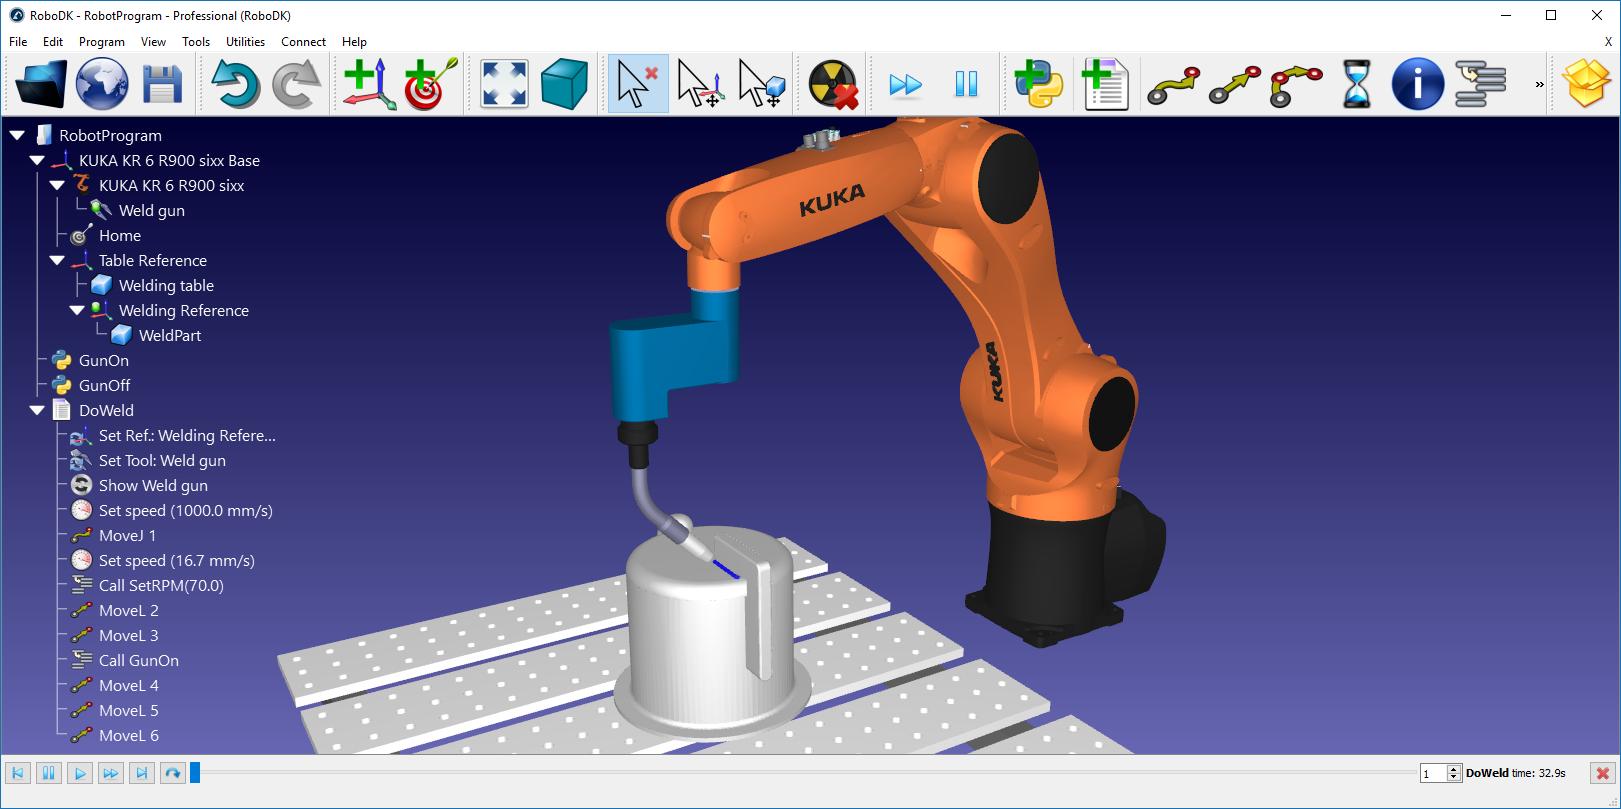 Robot Programs - RoboDK Documentation